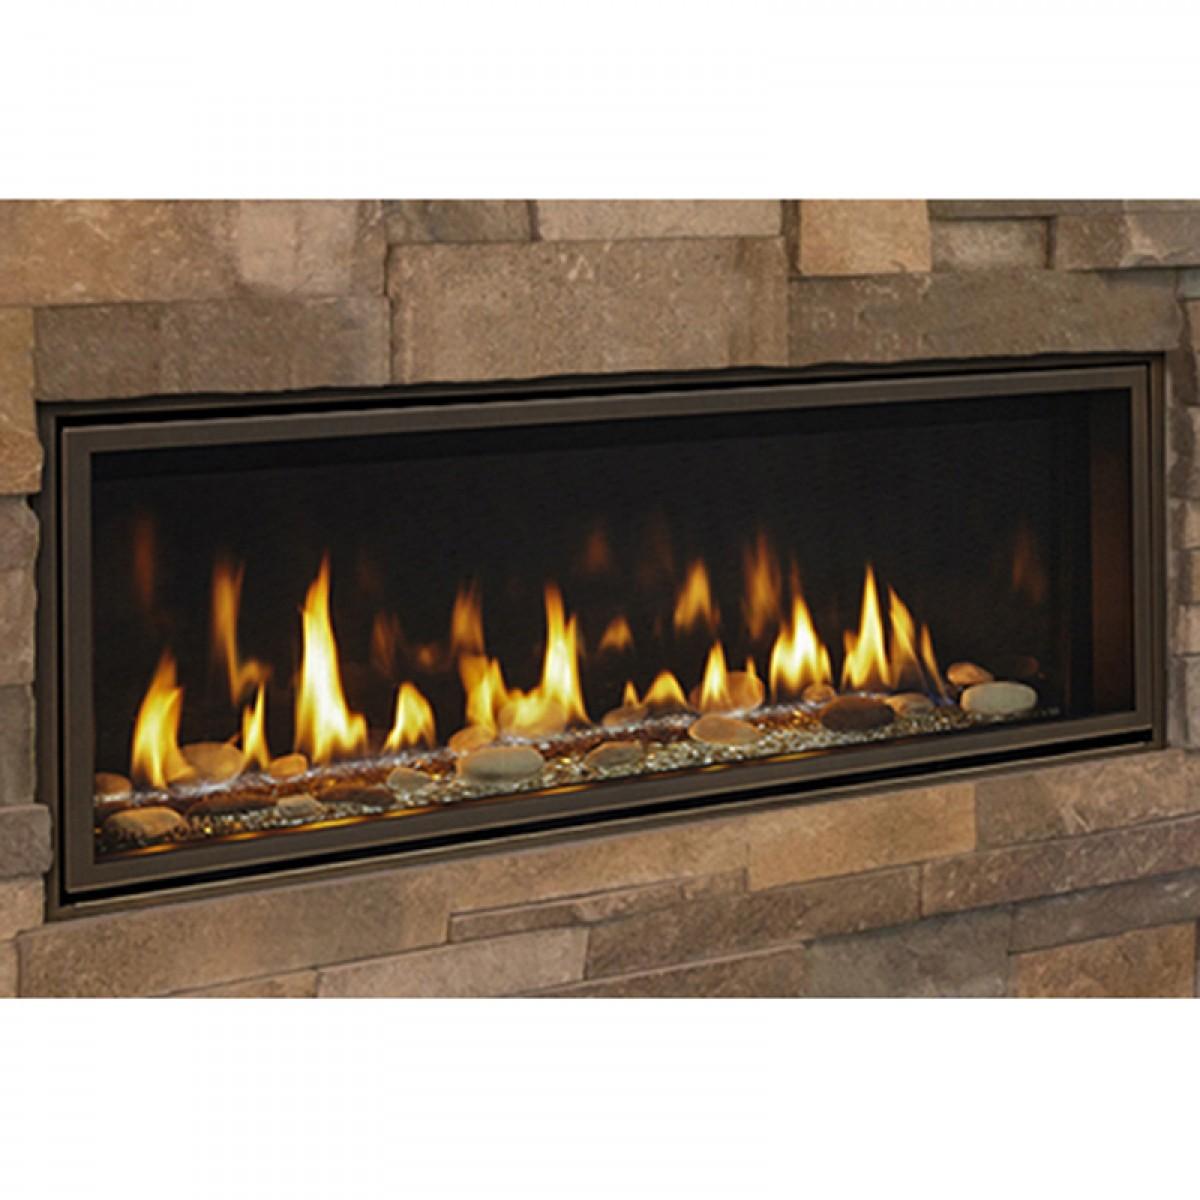 majestic biltmore wood burning fireplace inseason fireplaces best